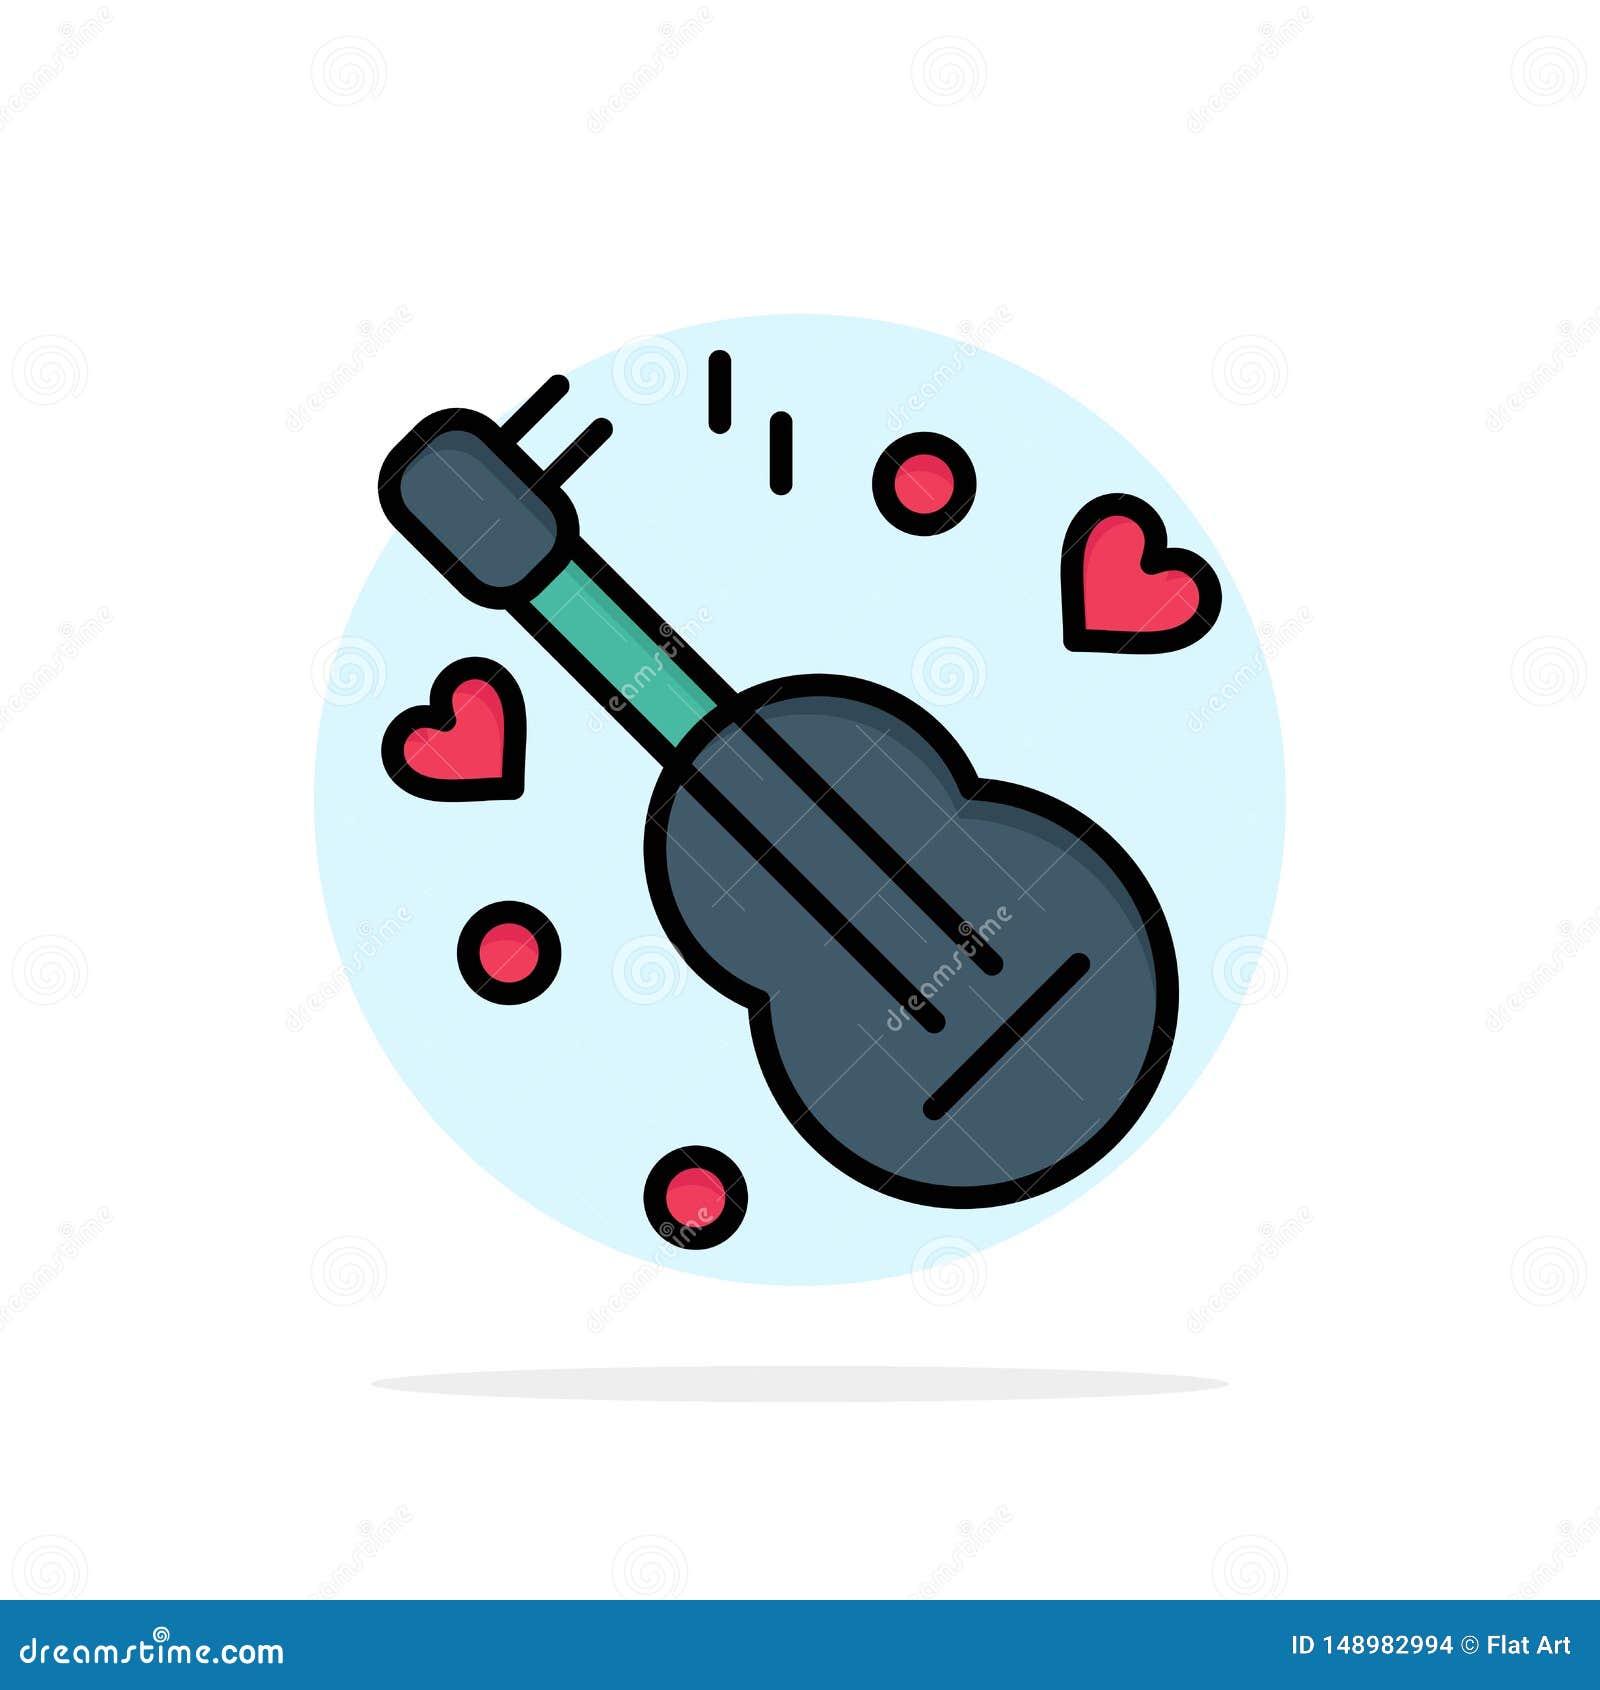 Guitarra, música, música, do fundo abstrato do círculo do amor ícone liso da cor